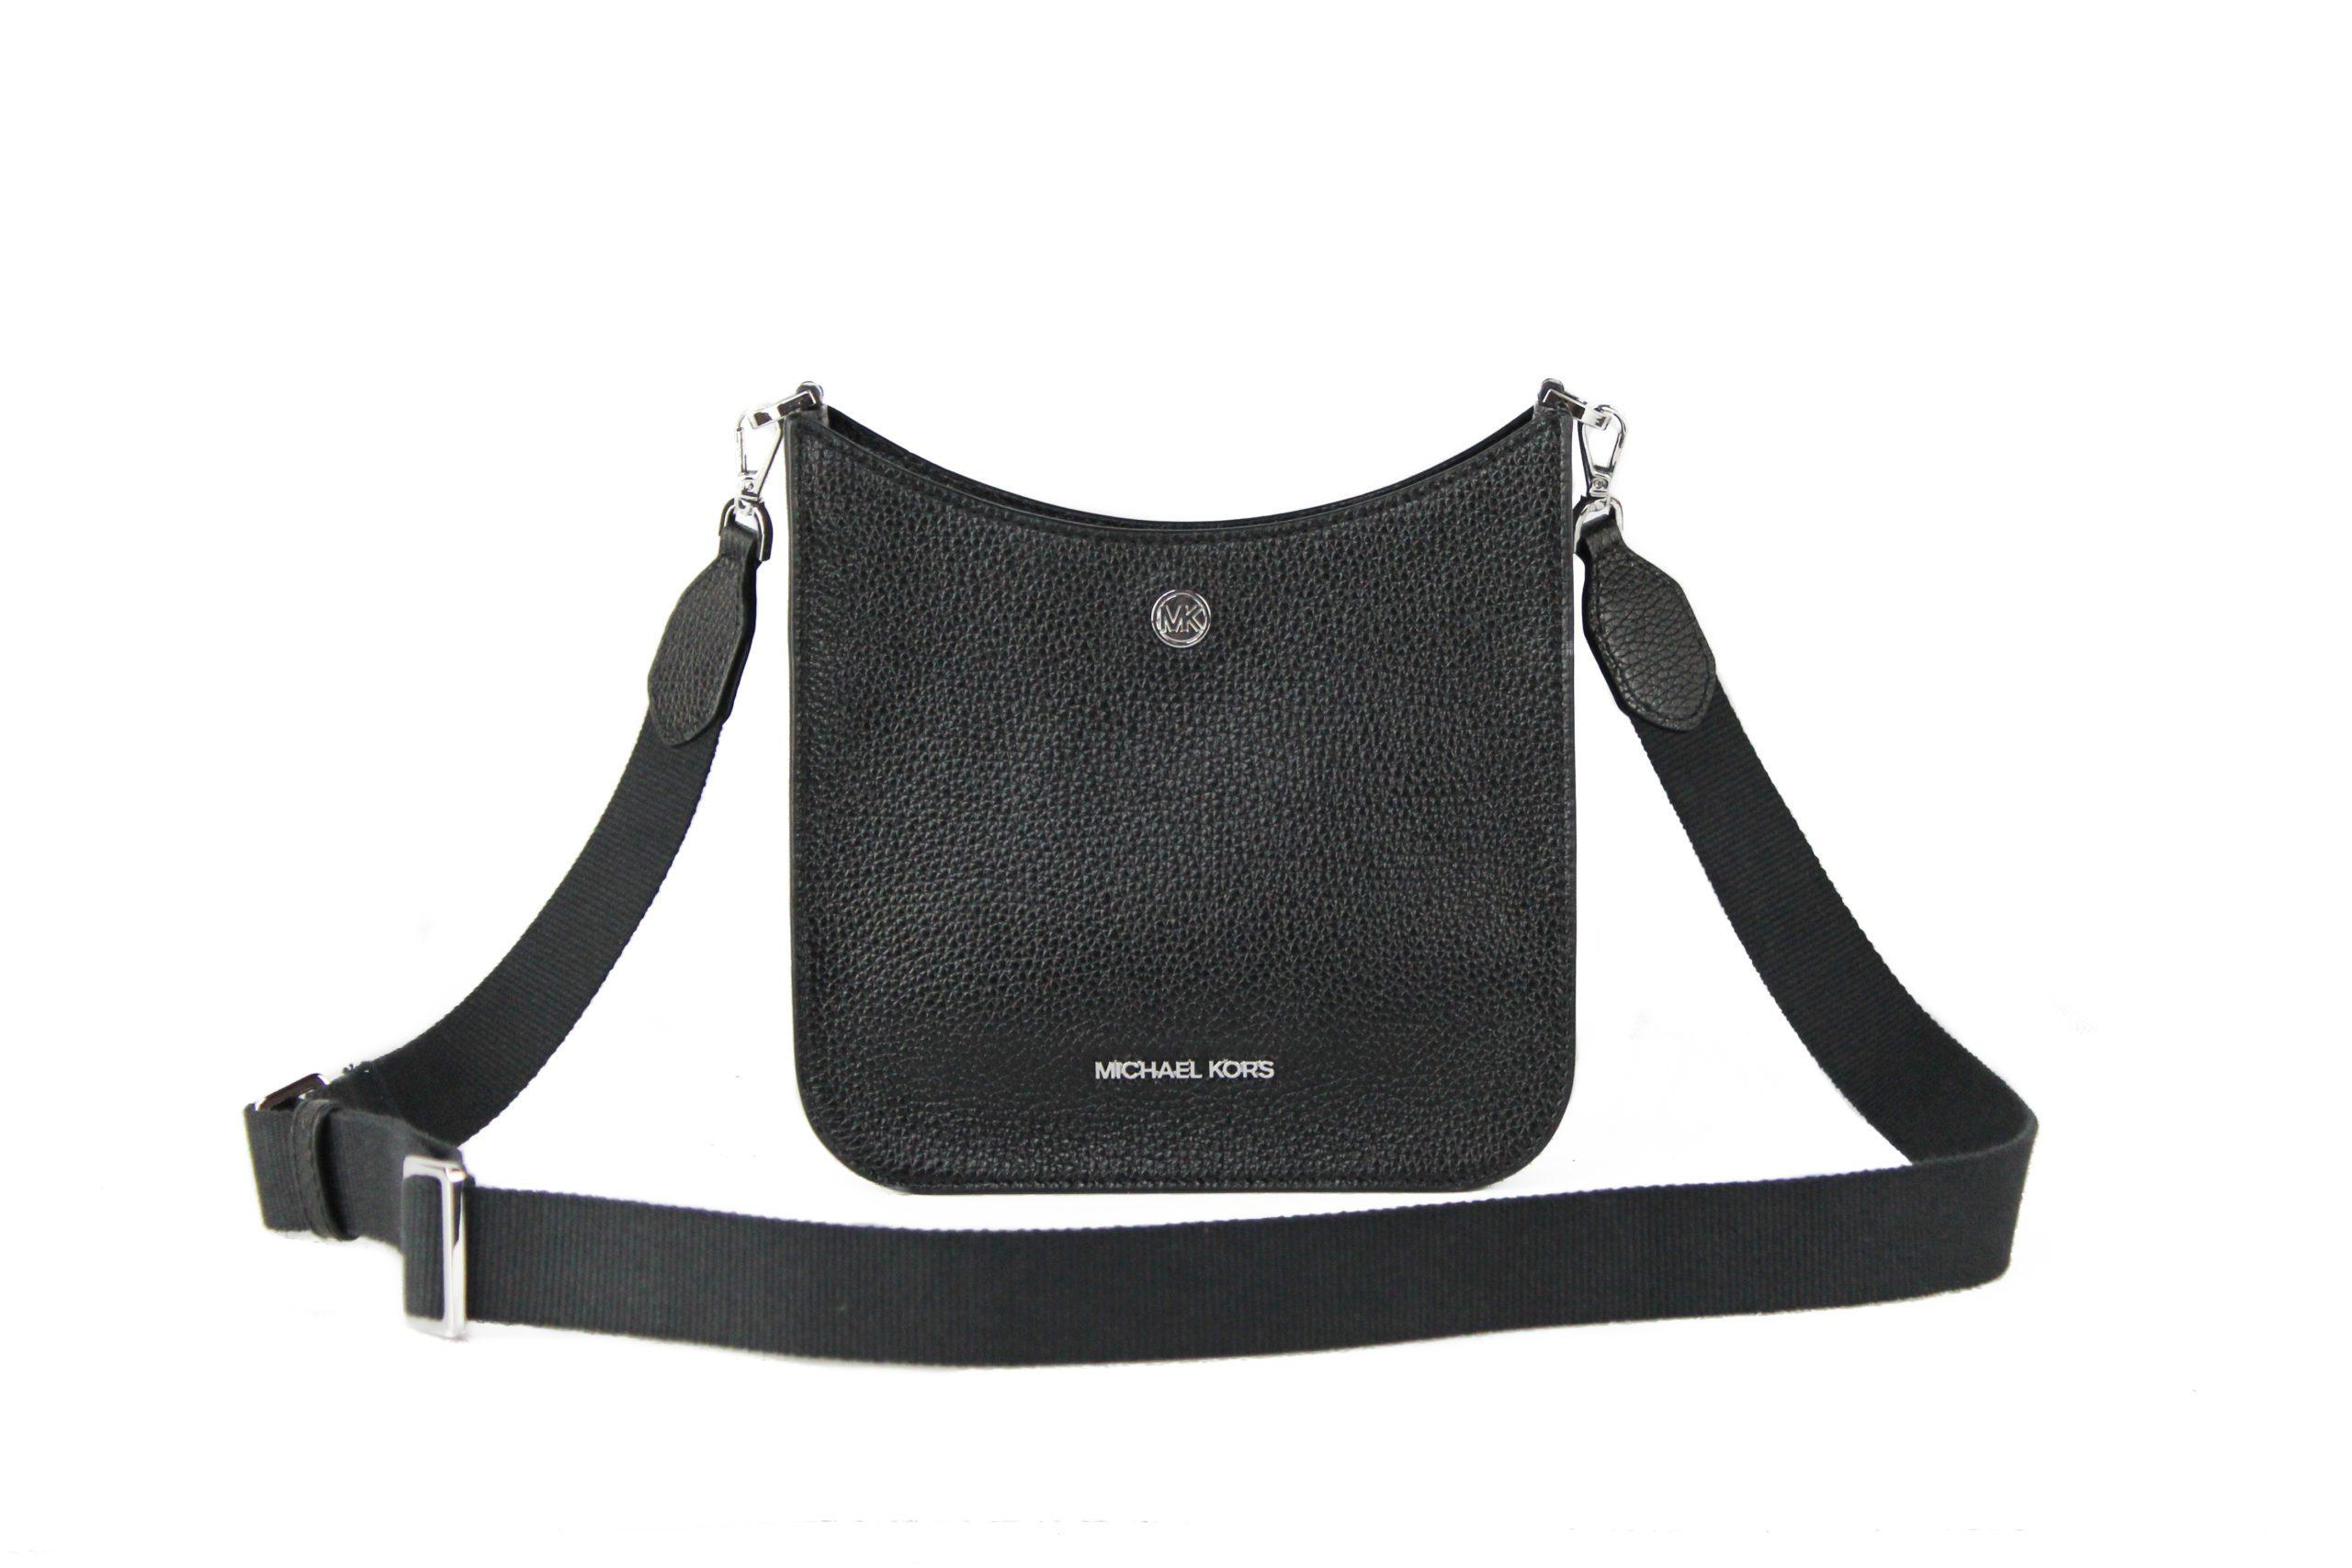 Michael Kors Women's Briley Bag Black 94369